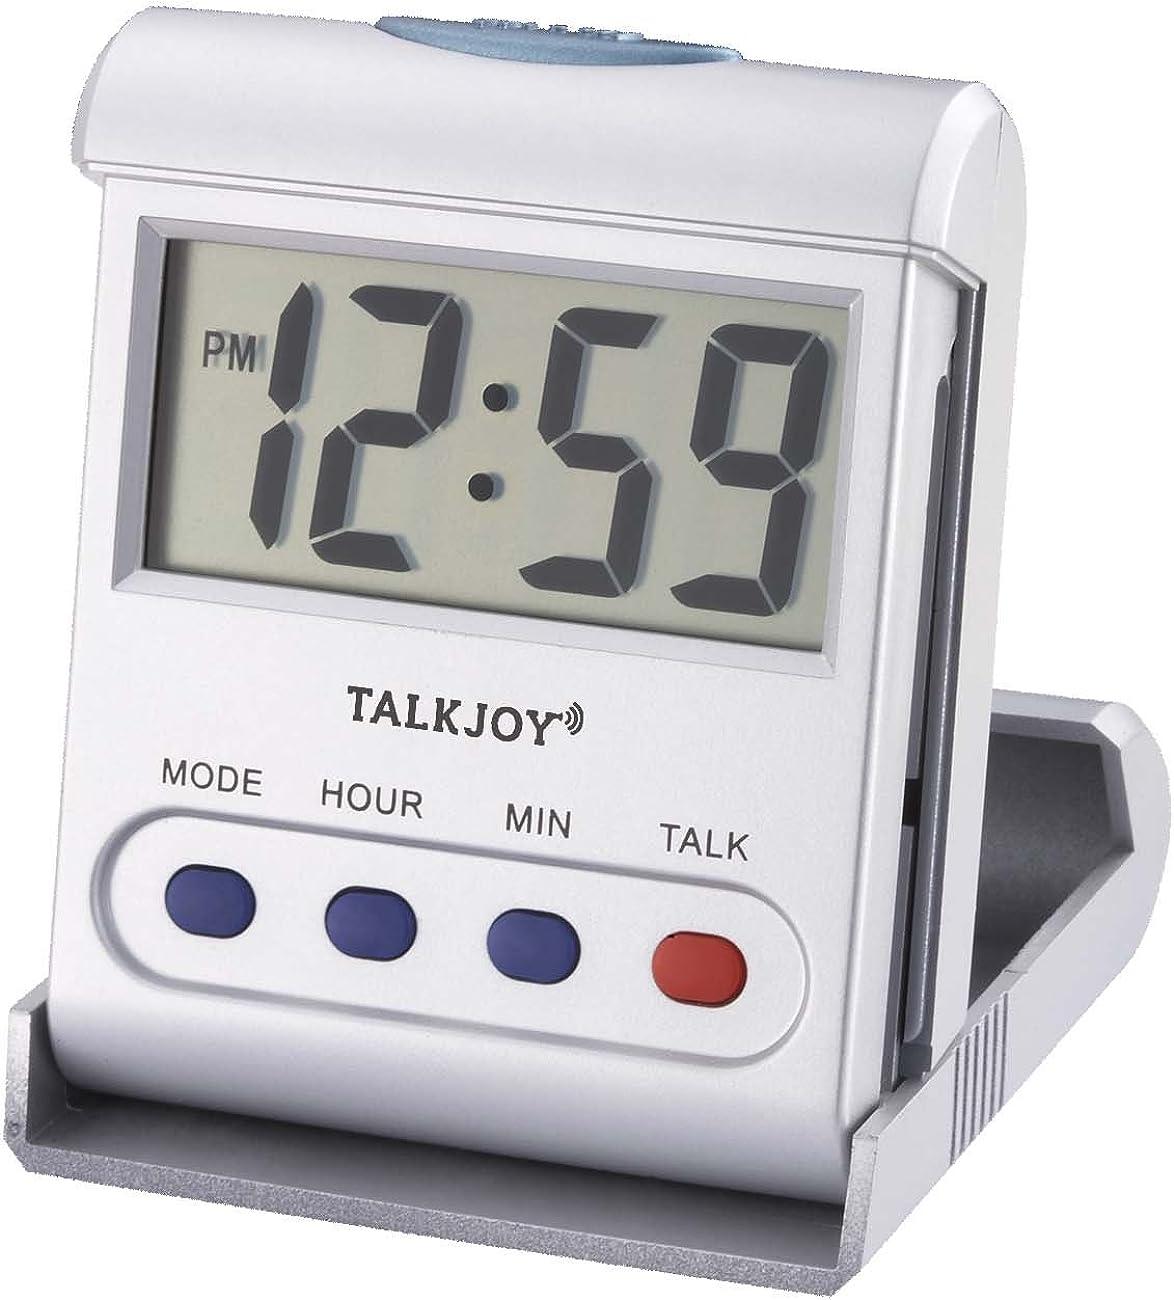 Pro Parlante Reloj Reloj de Mesa sehbehinderte Ancianos impedidos muñeca Reloj Tiempo ansage